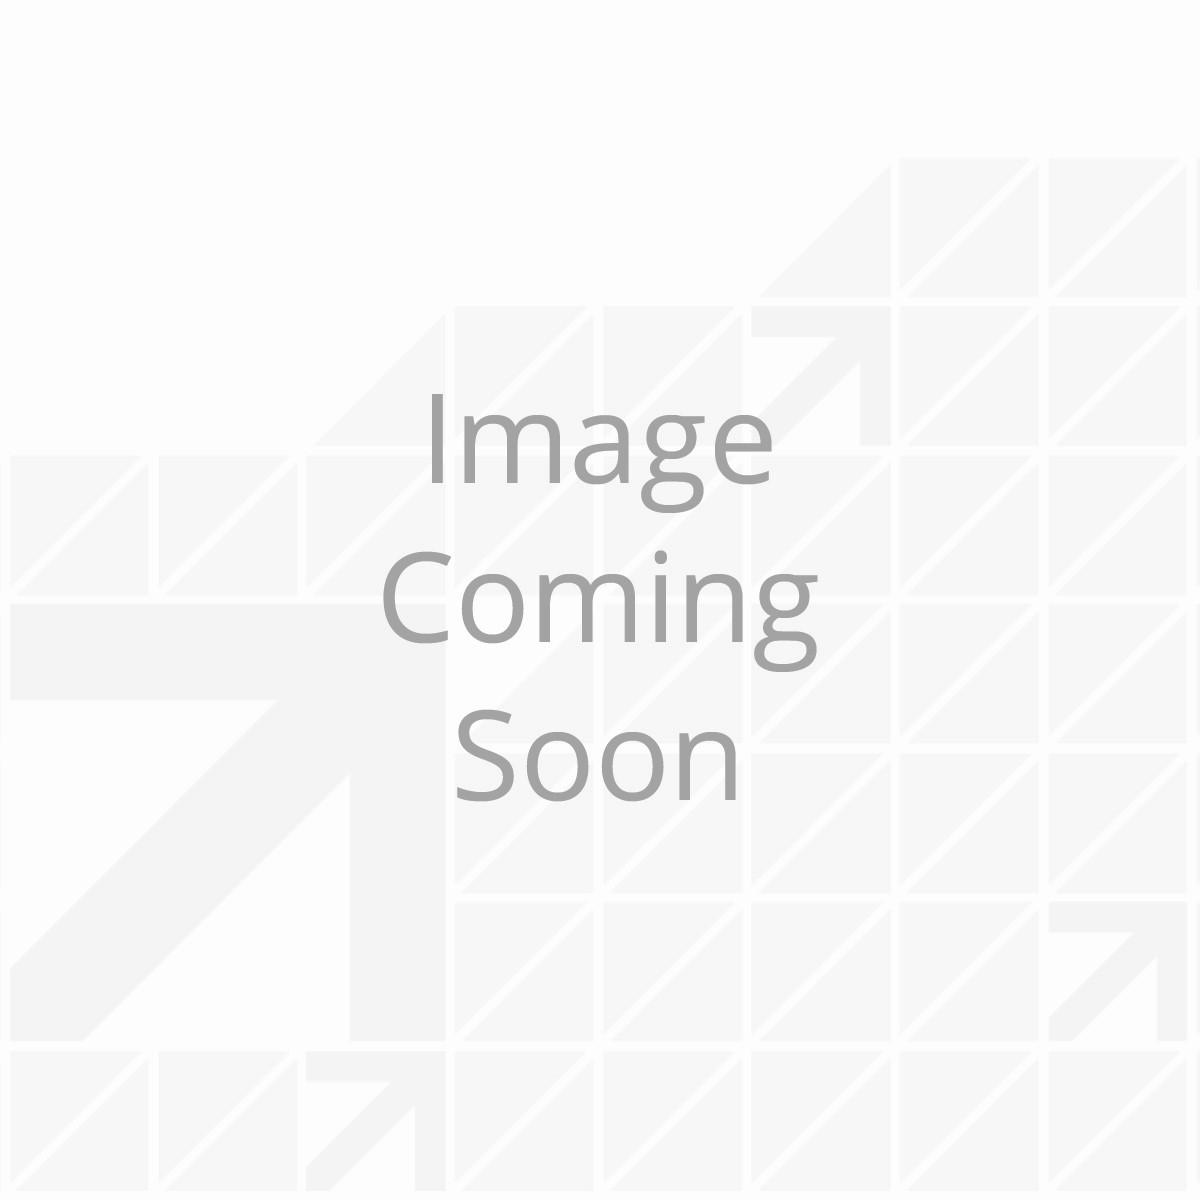 2 Room Manifold & Valves (w/o Plate)